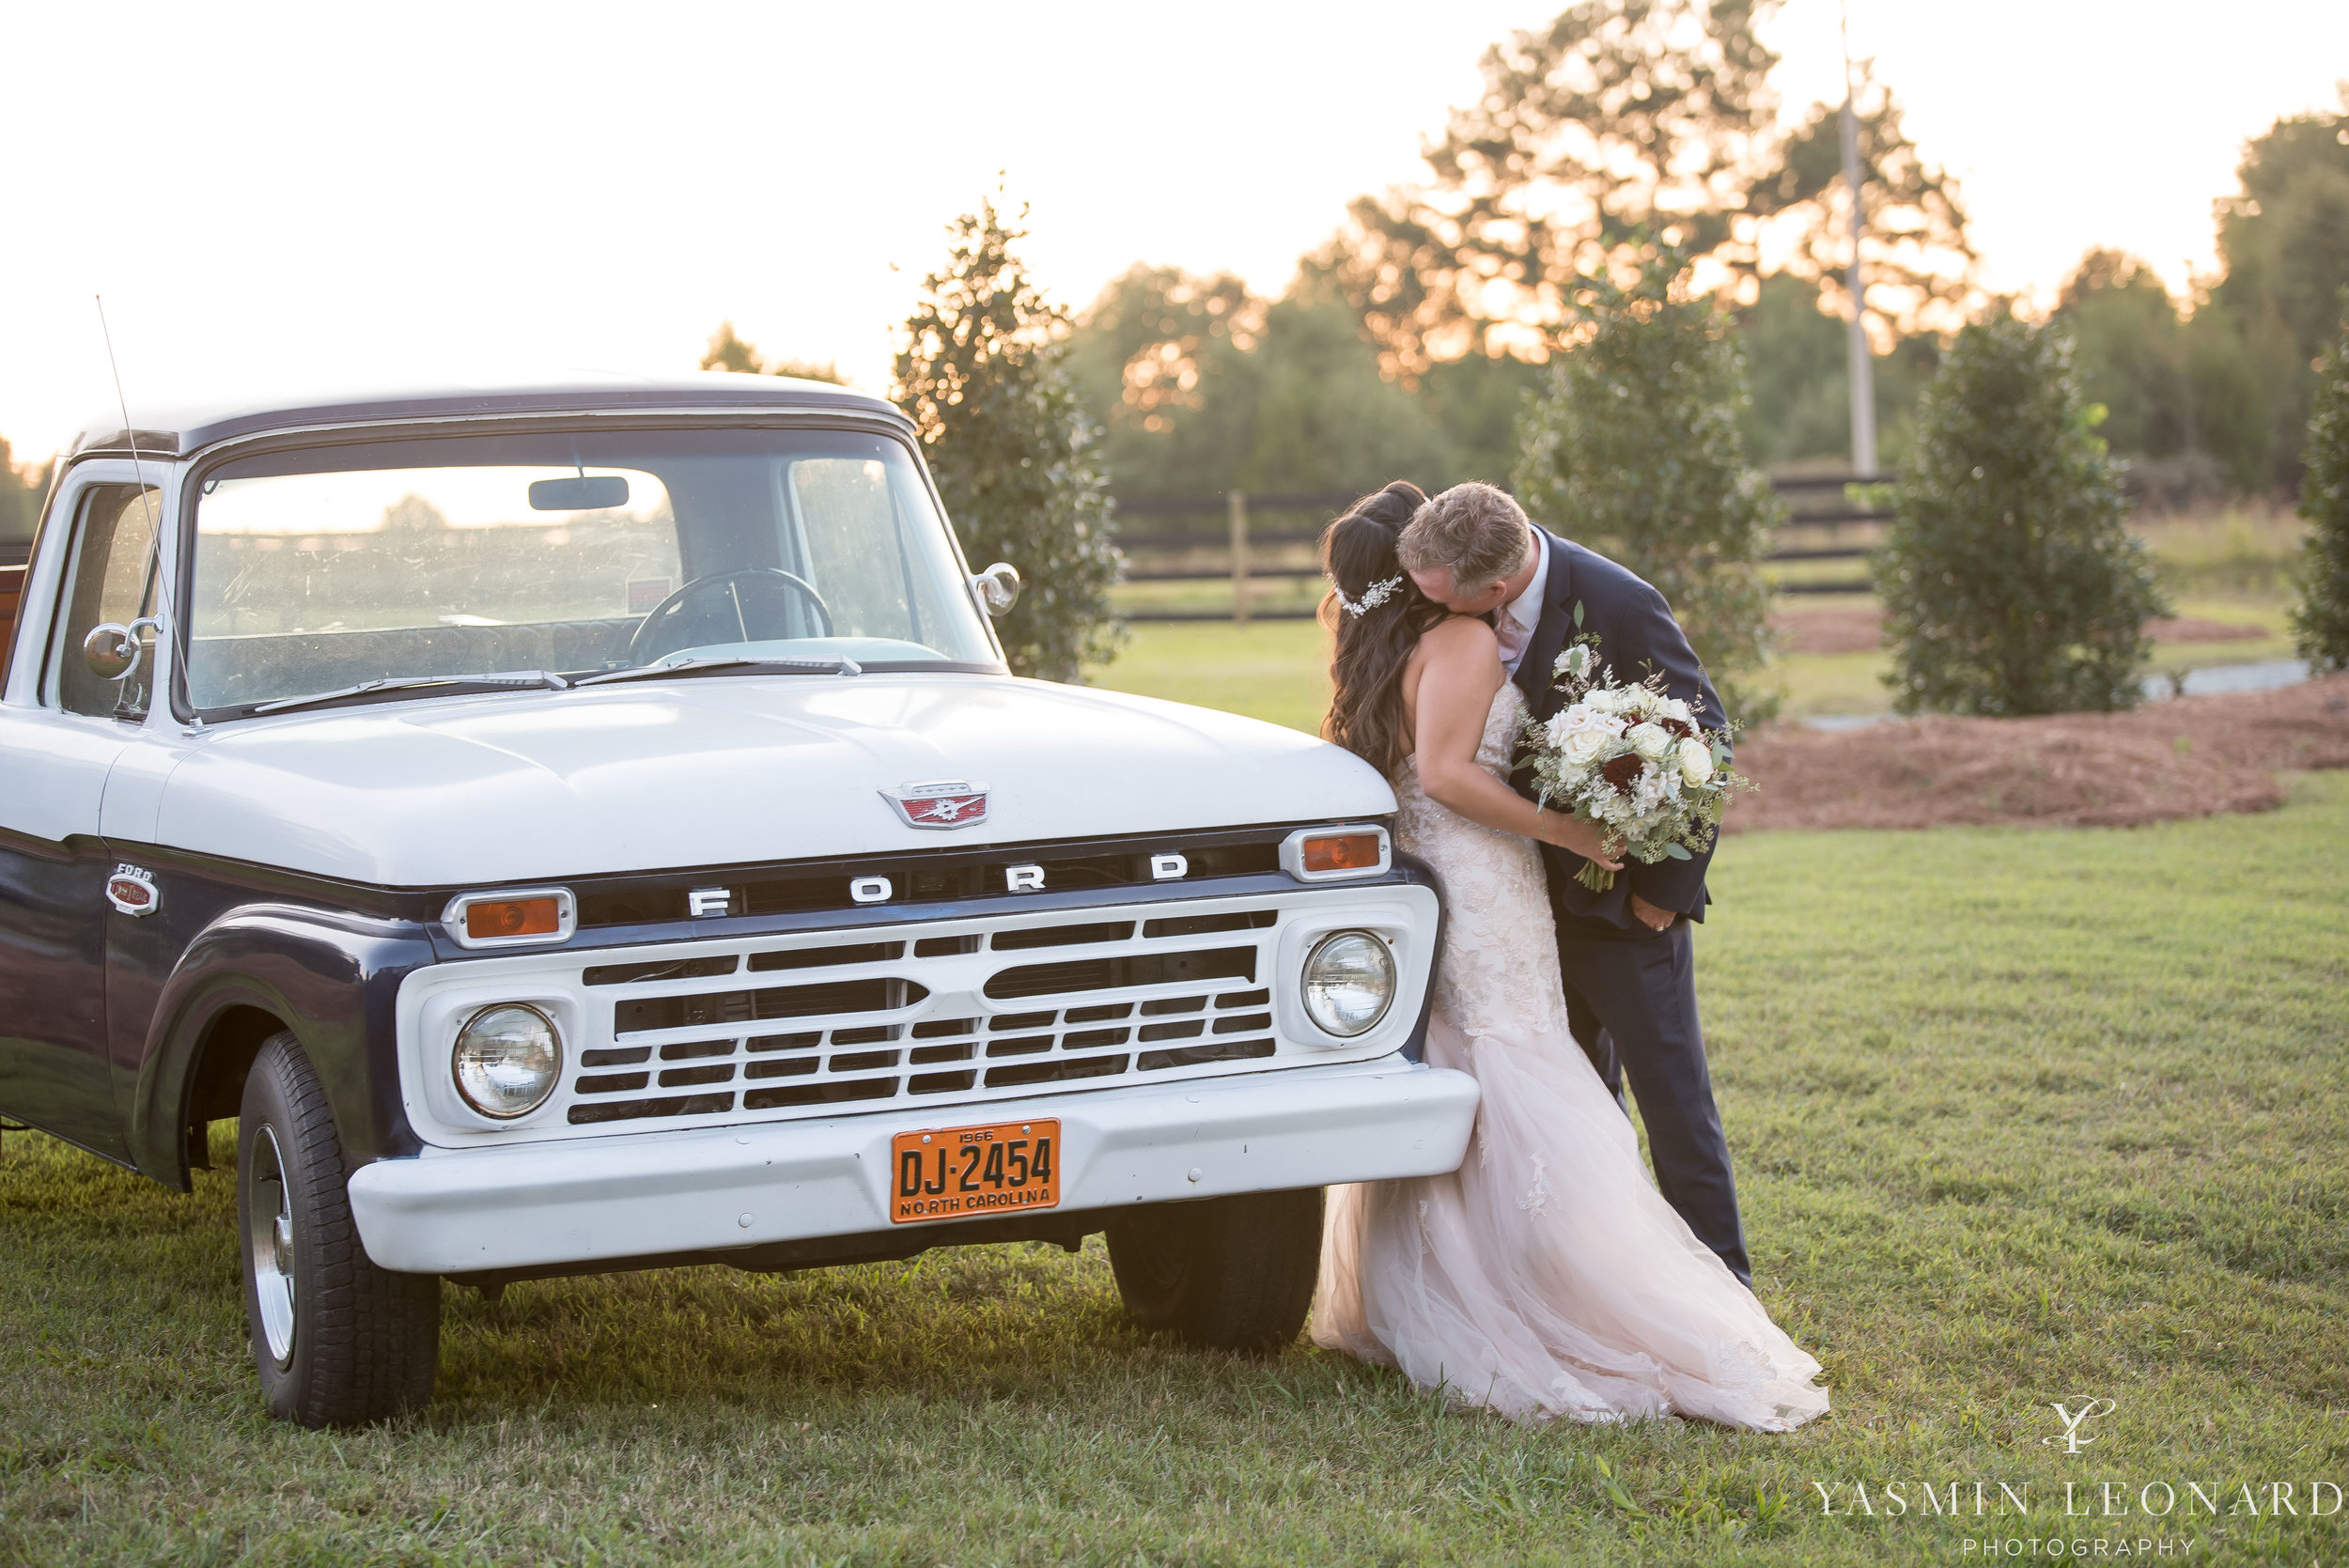 Mason Ridge   Liberty, NC   Aylissa and John   Yasmin Leonard Photography-72.jpg